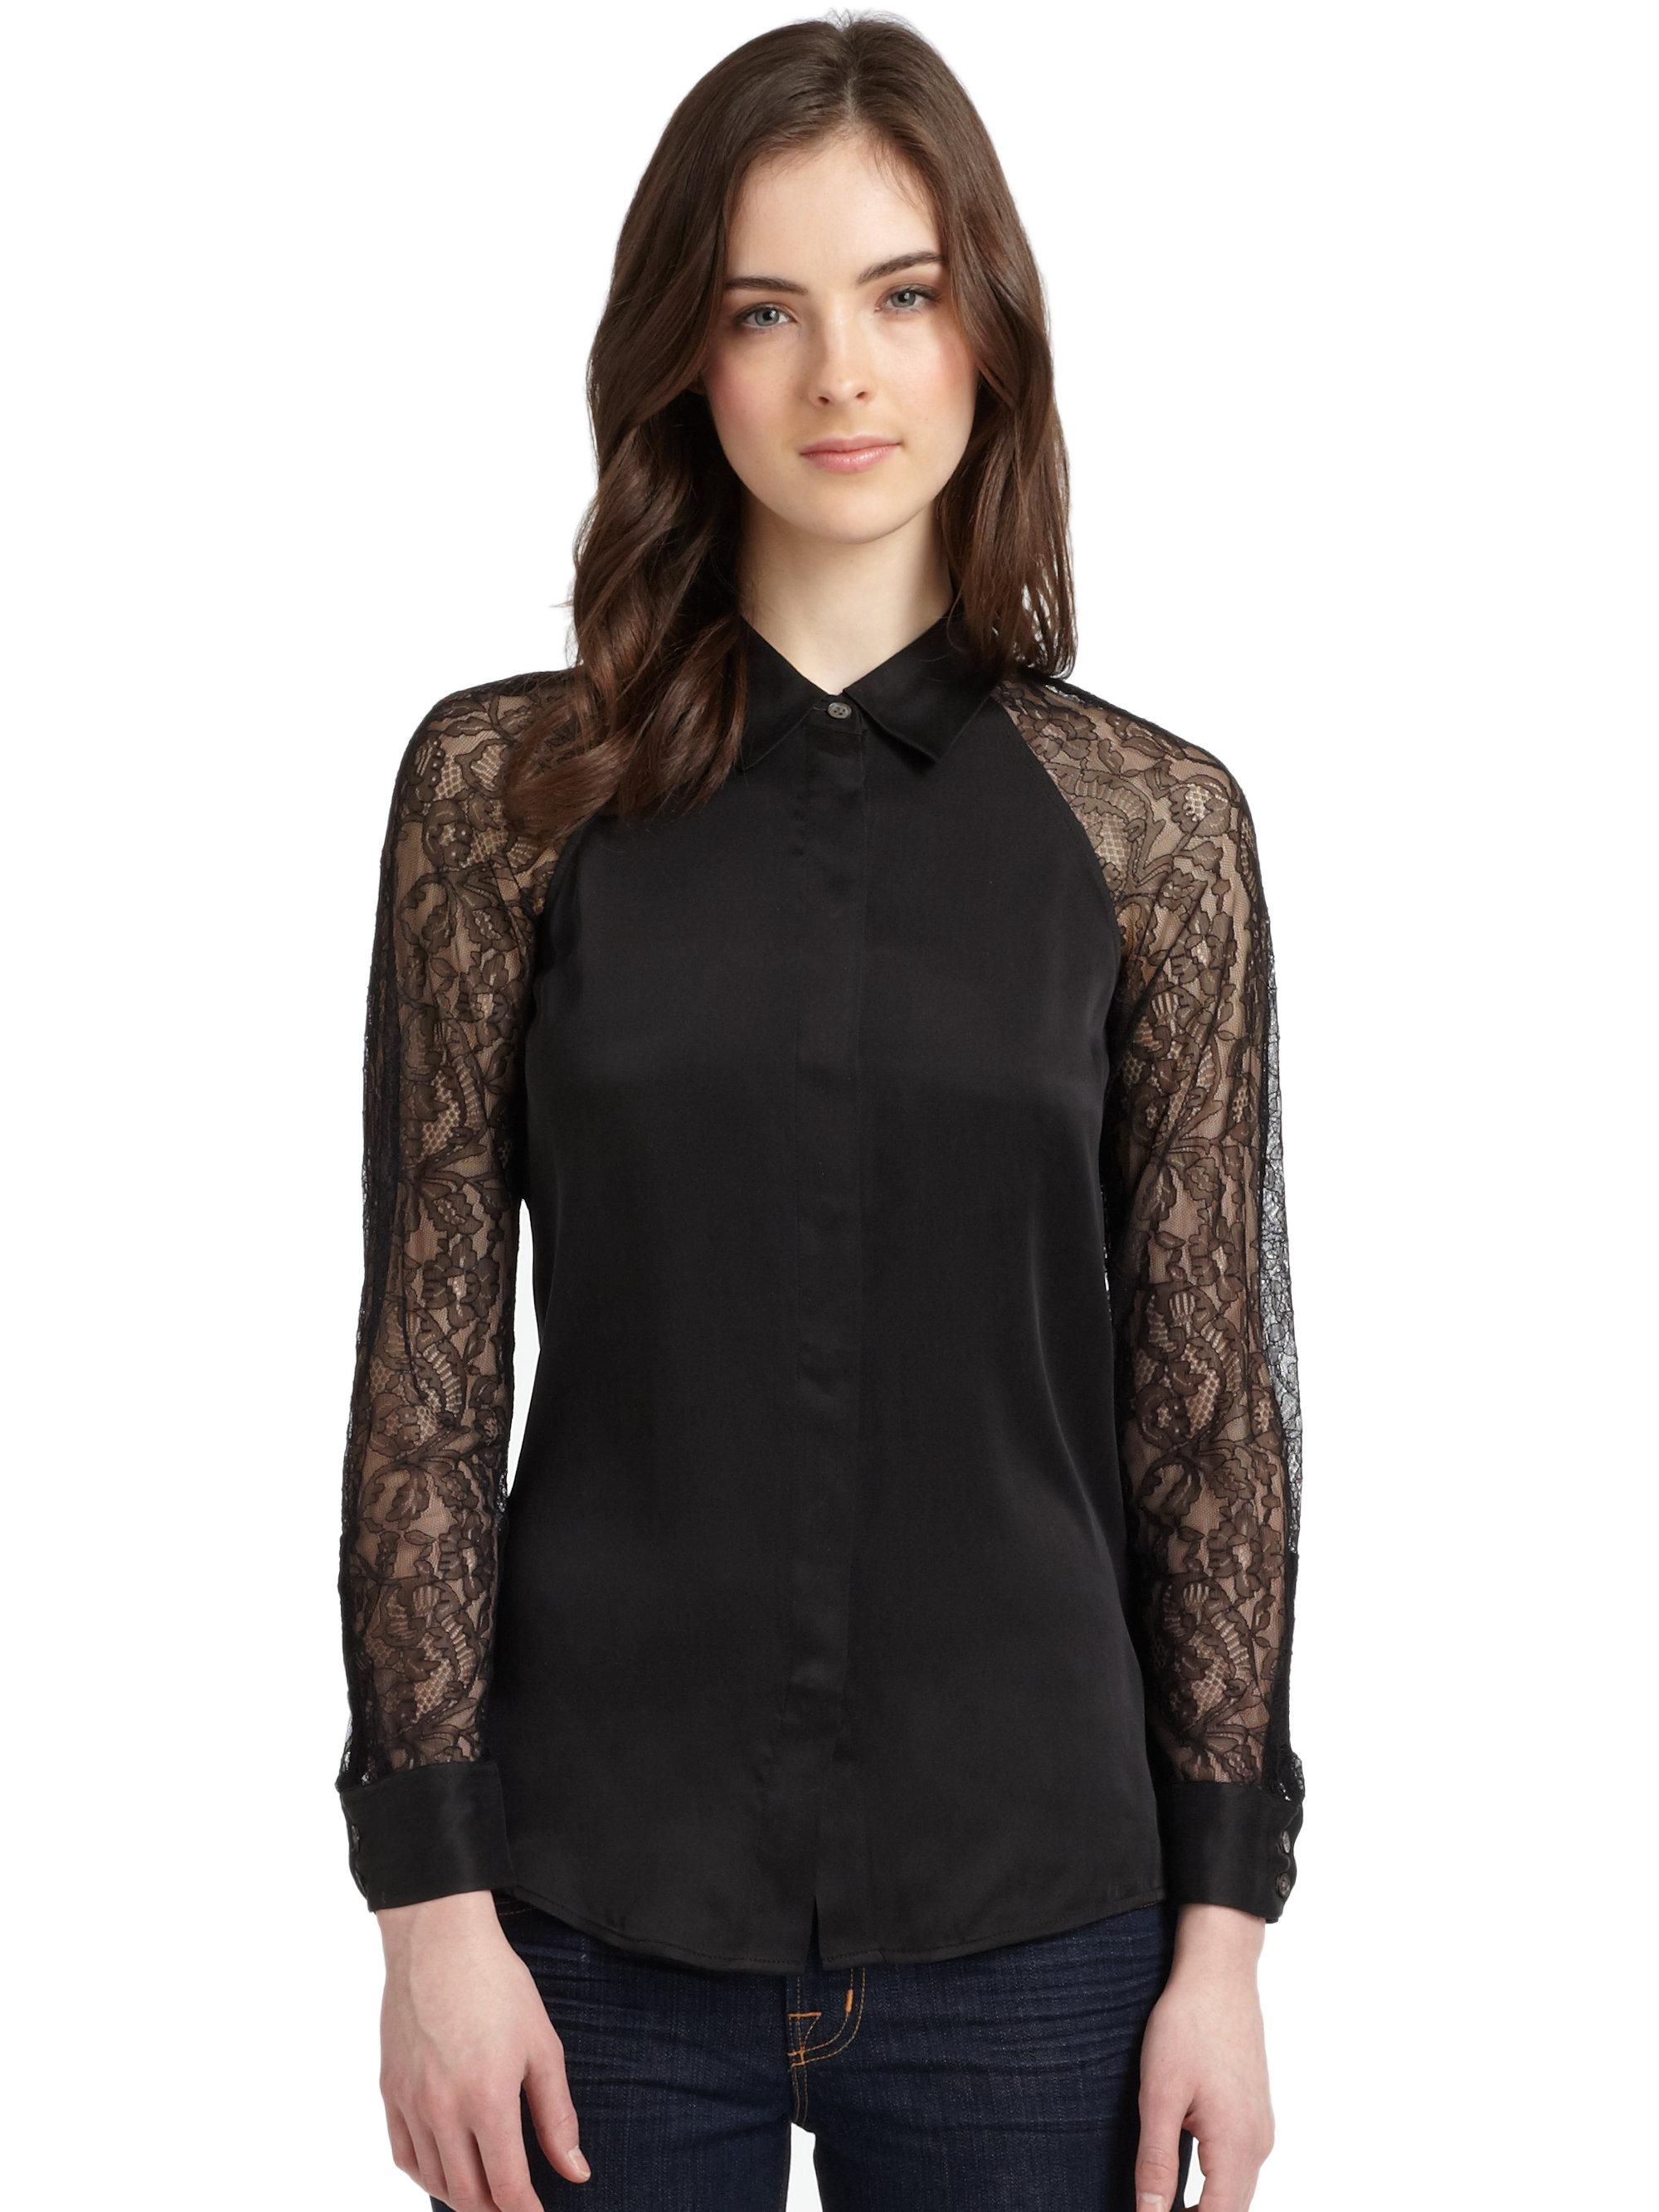 Equipment quinn silk lace sleeve blouse in black lyst for Equipment black silk shirt